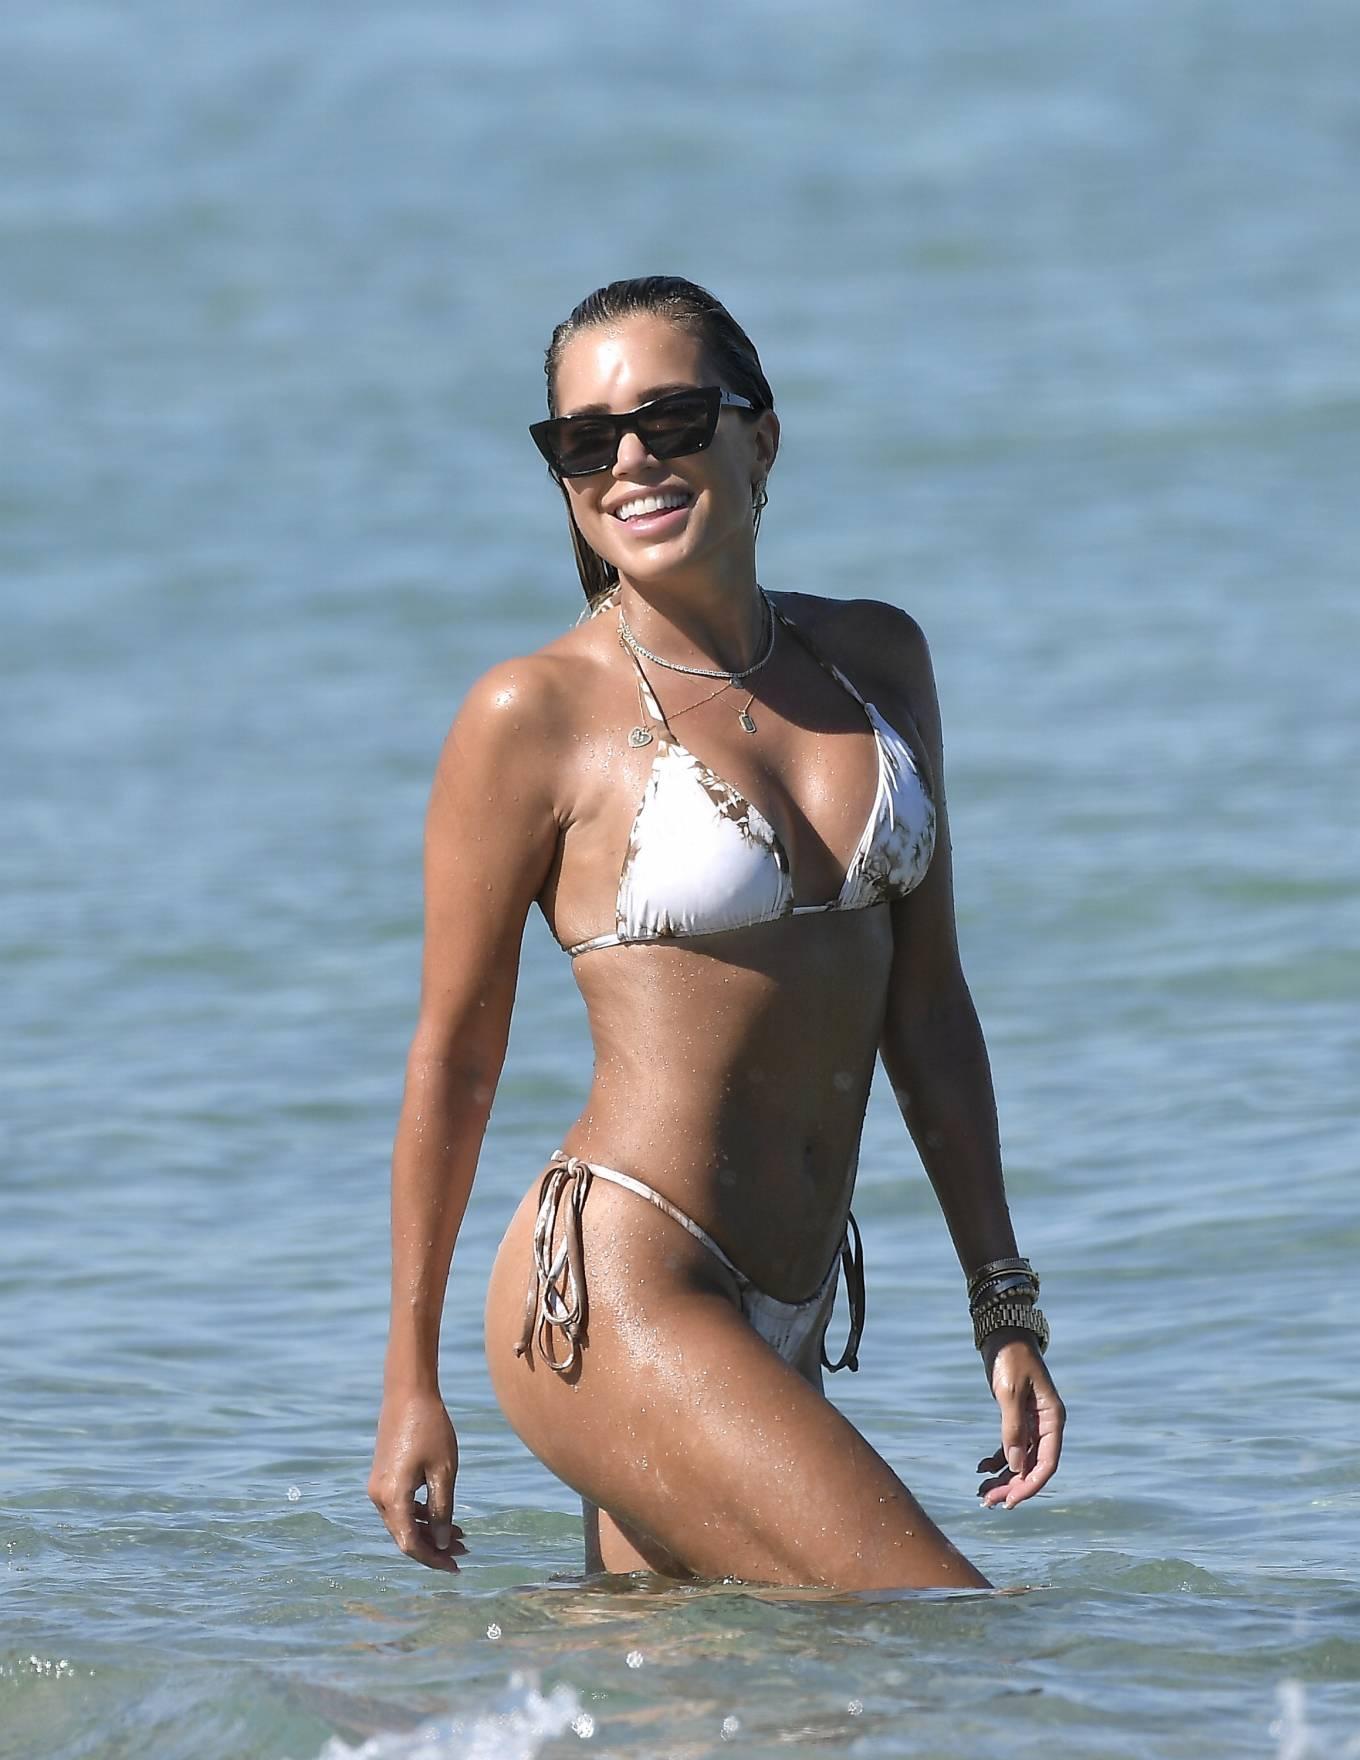 Sylvie Meis - Bikini candids on the beach in Saint Tropez